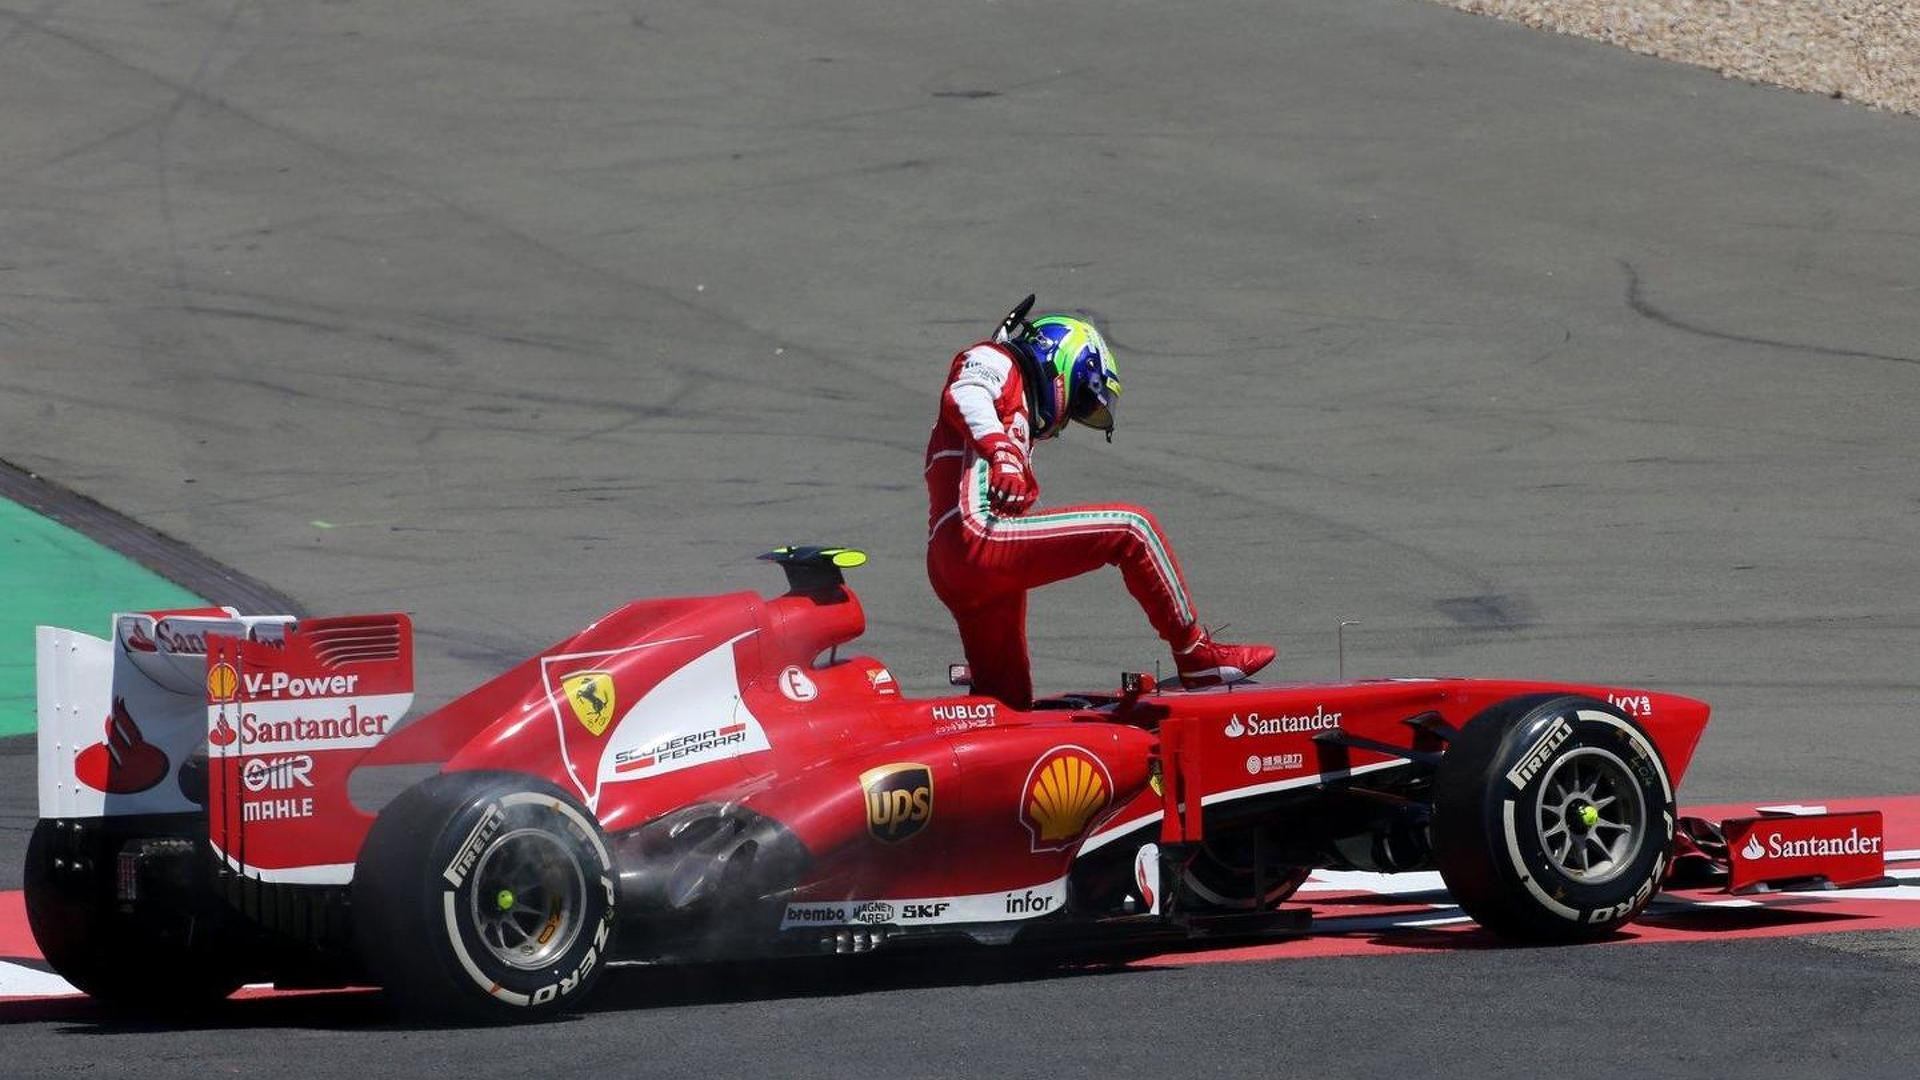 'No idea' if incidents will cost Massa seat